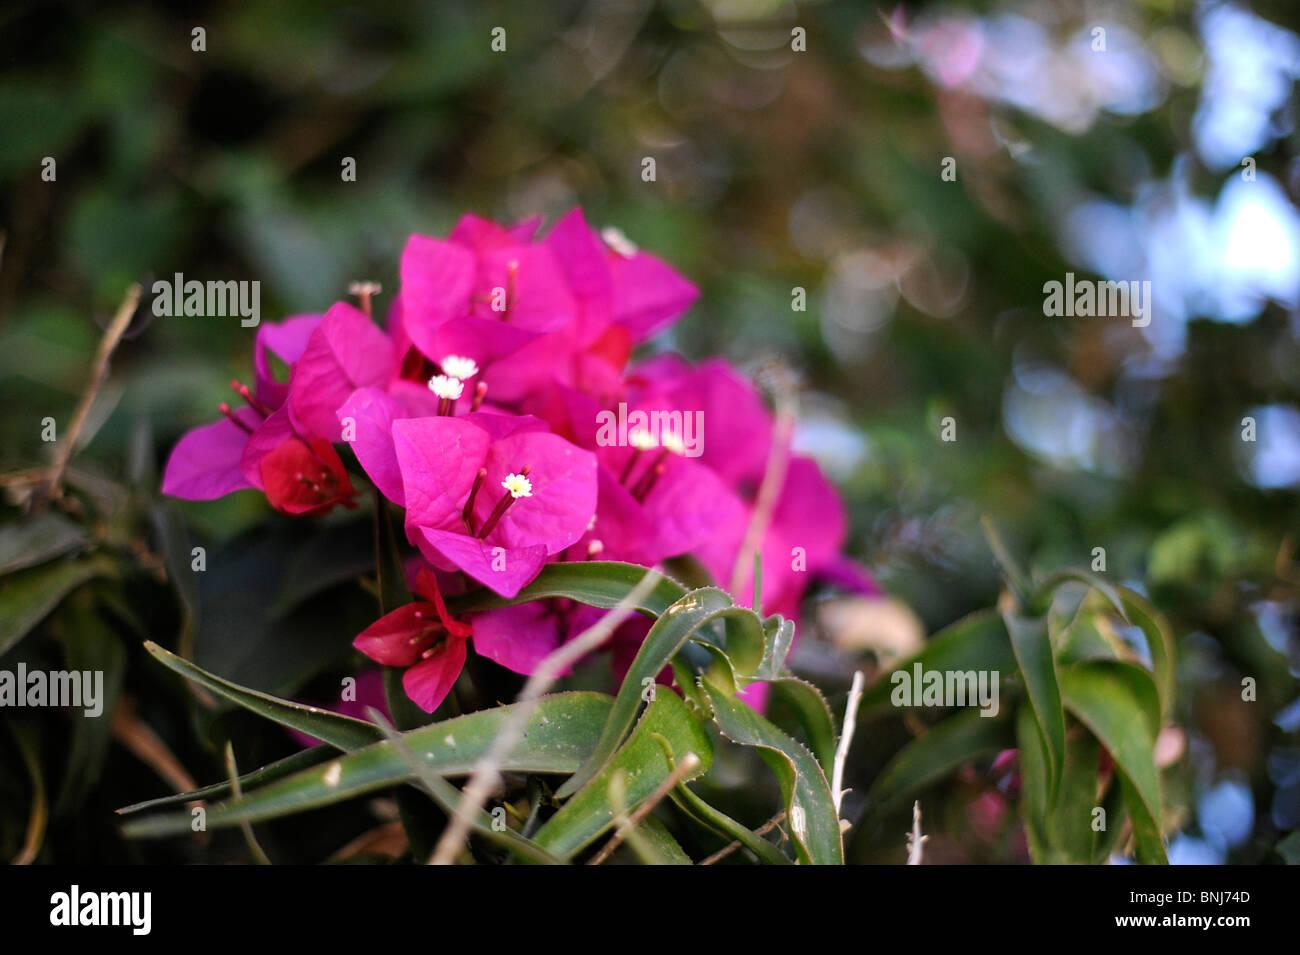 Bougainville Fleur avec weihrauch photos & weihrauch images - alamy